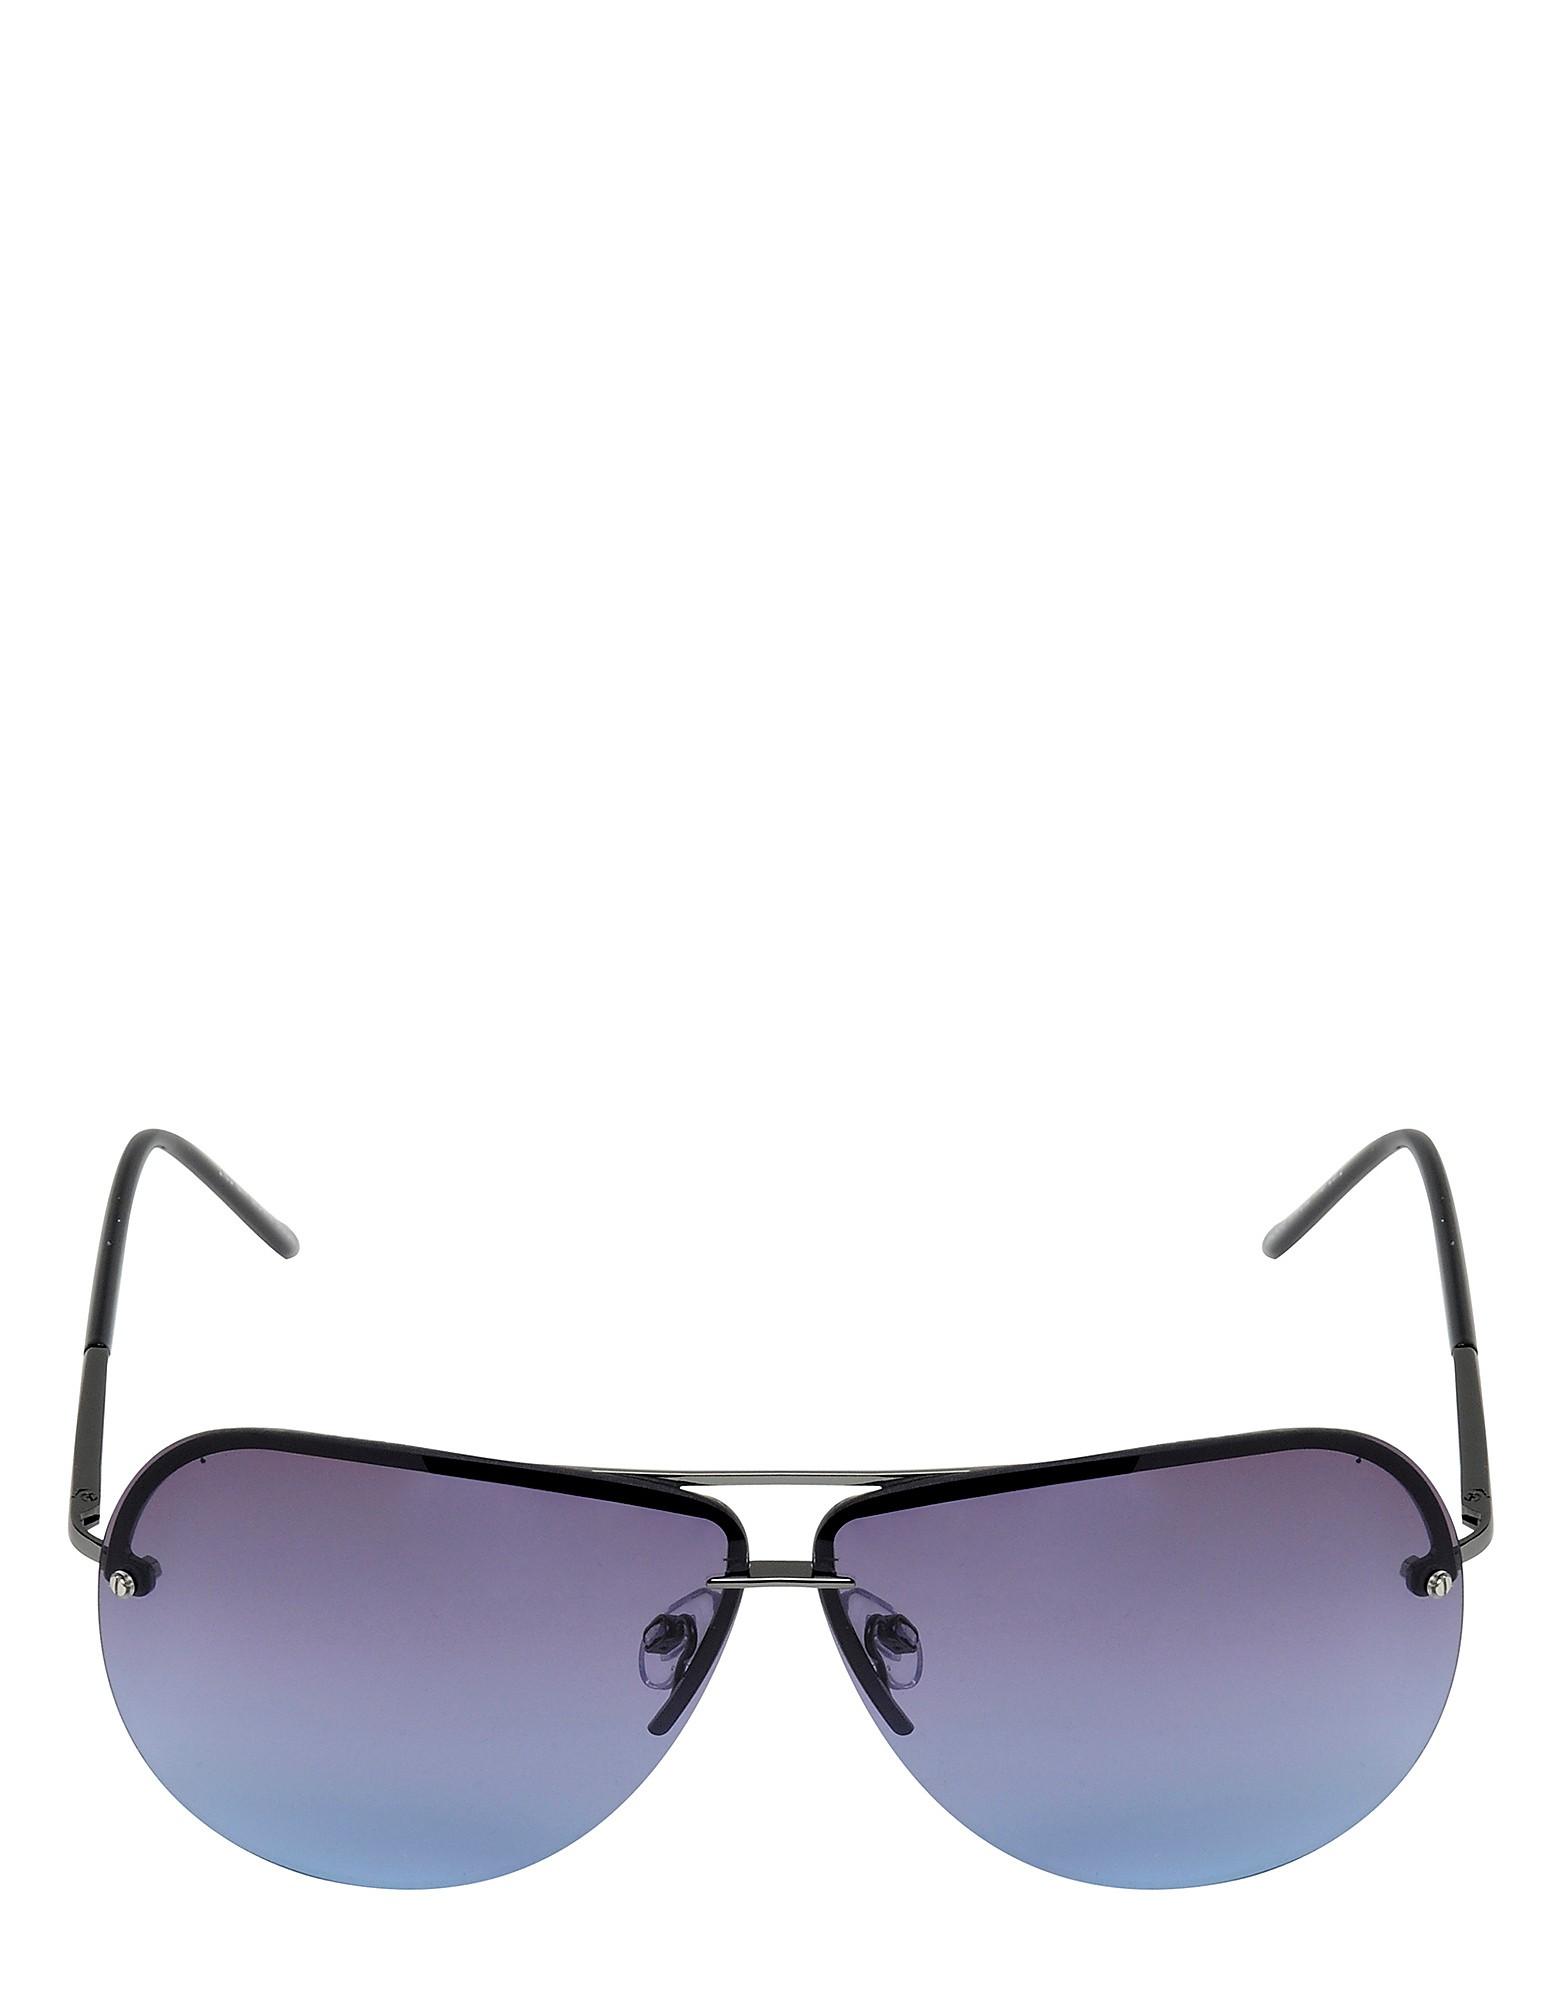 Brookhaven Winford Aviator Style Sunglasses